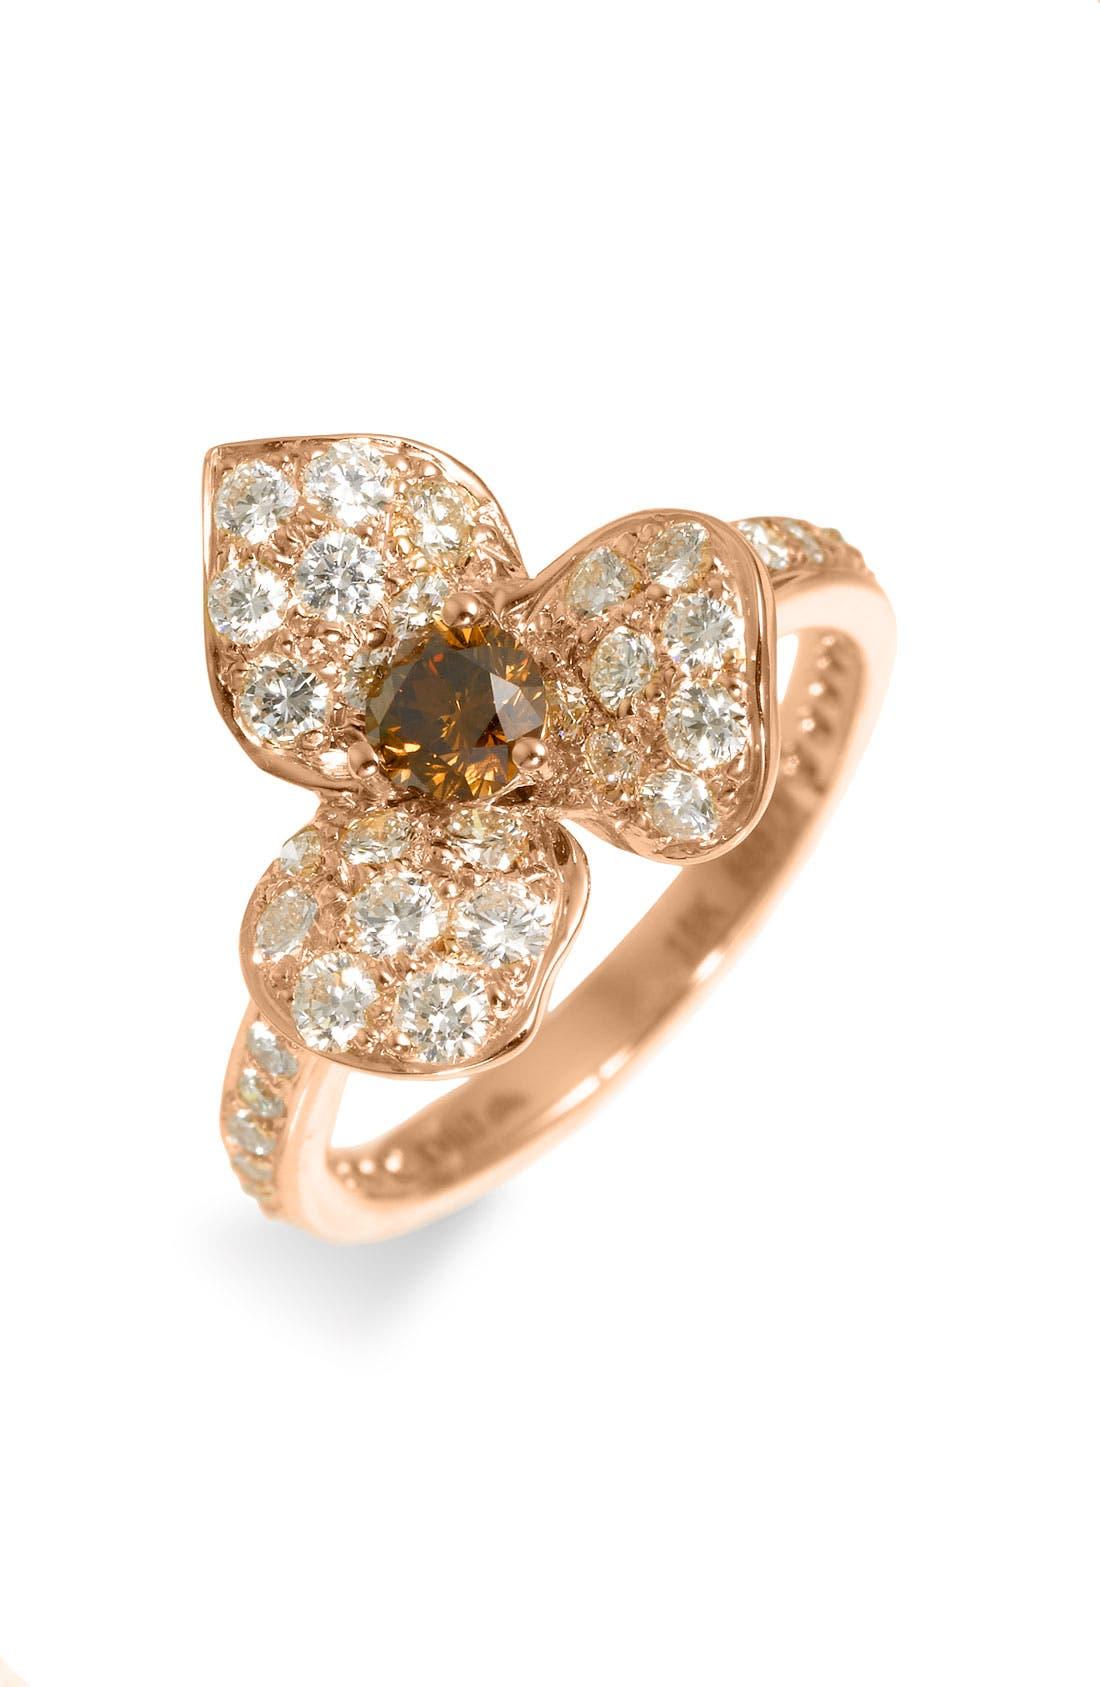 Main Image - Kwiat Champagne Diamond Flower Ring